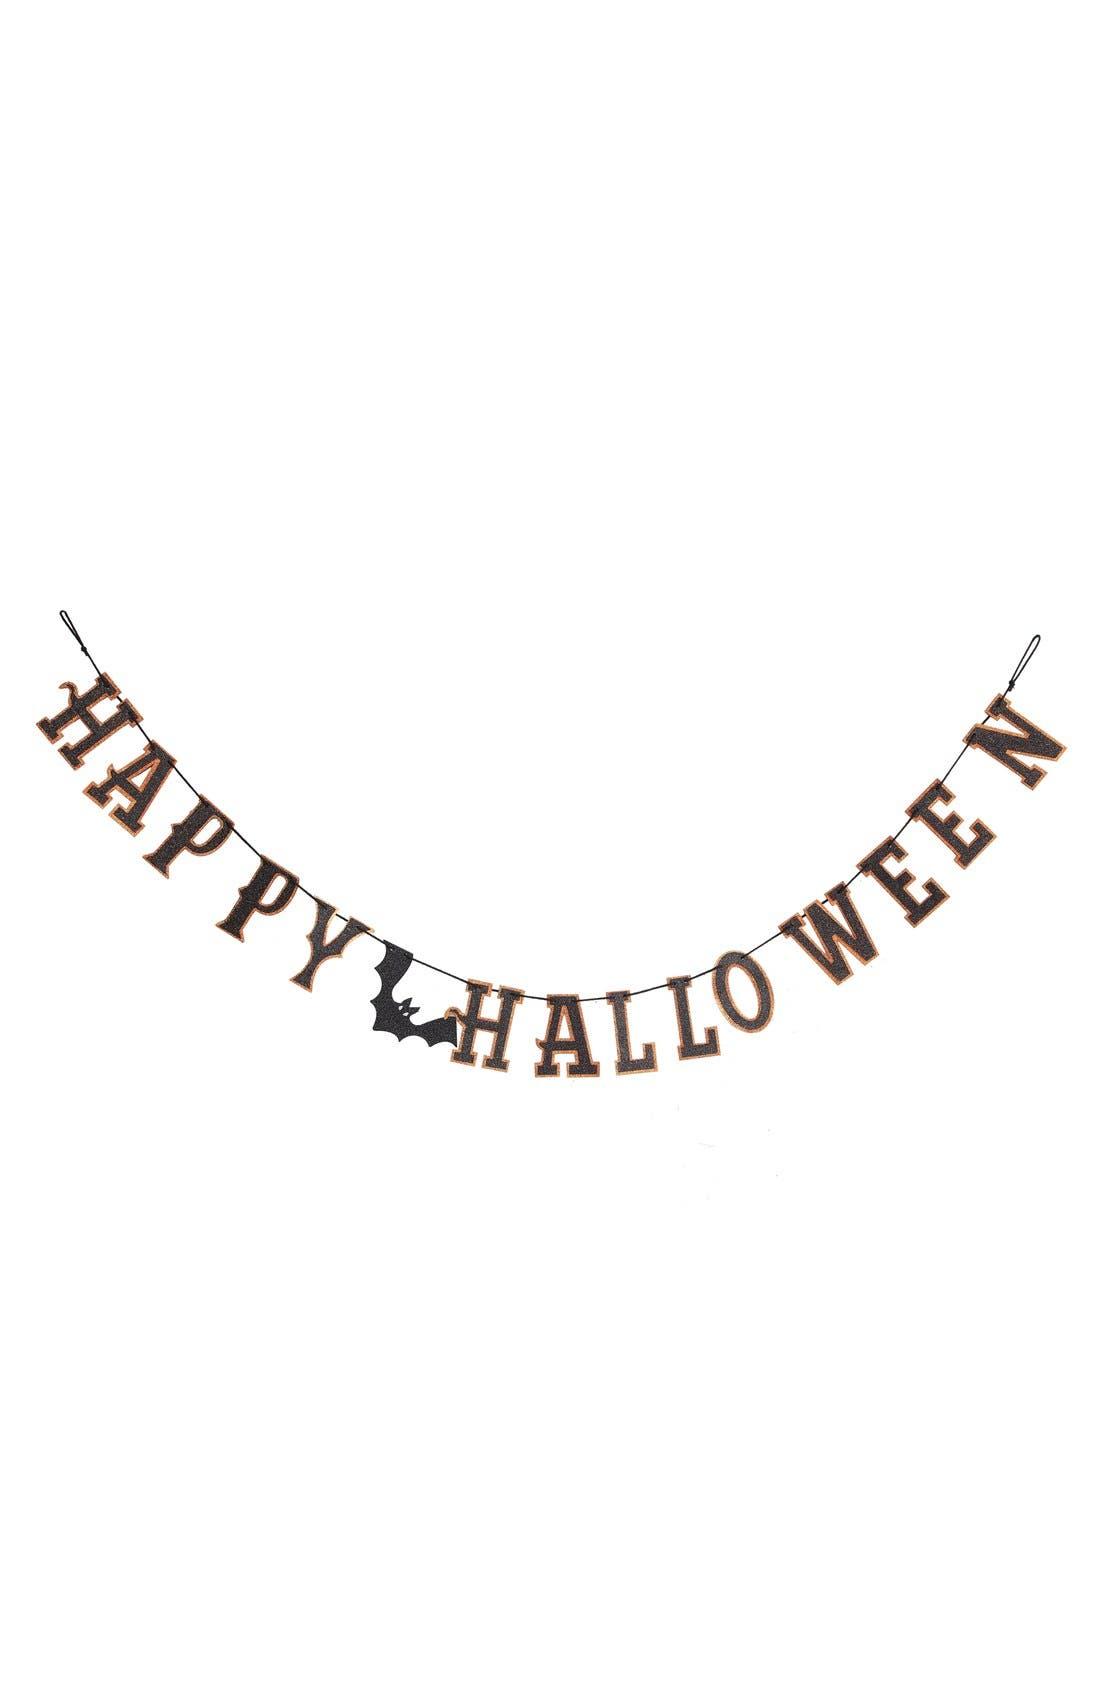 Alternate Image 1 Selected - Creative Co-Op 'Happy Halloween' Paper Garland